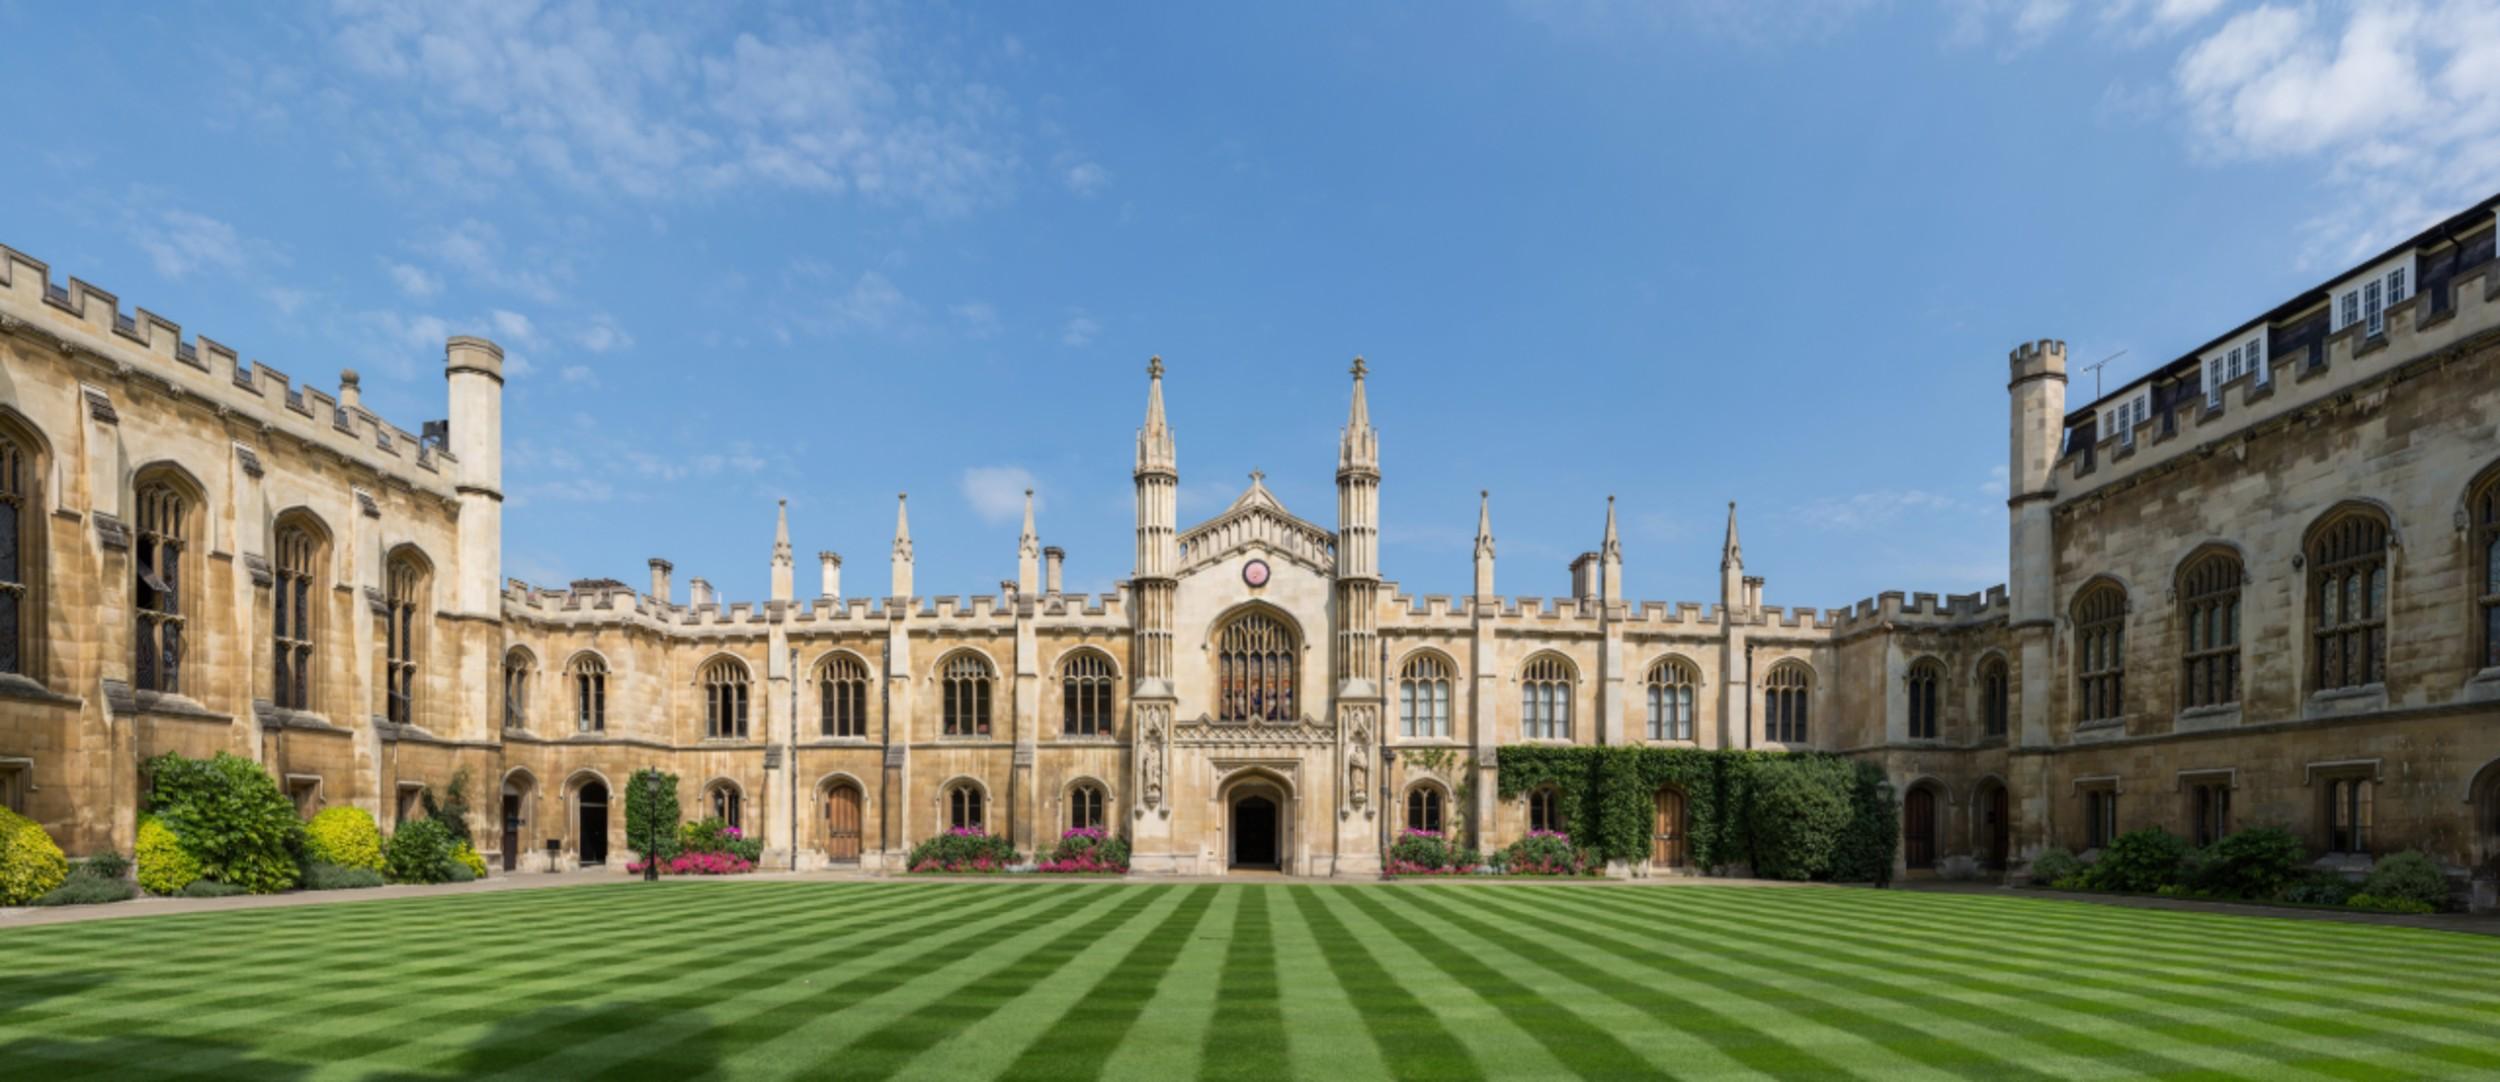 A picture of Photo credit- Diliff/ Wiki Commons. The prestigious Corpus Christi College.